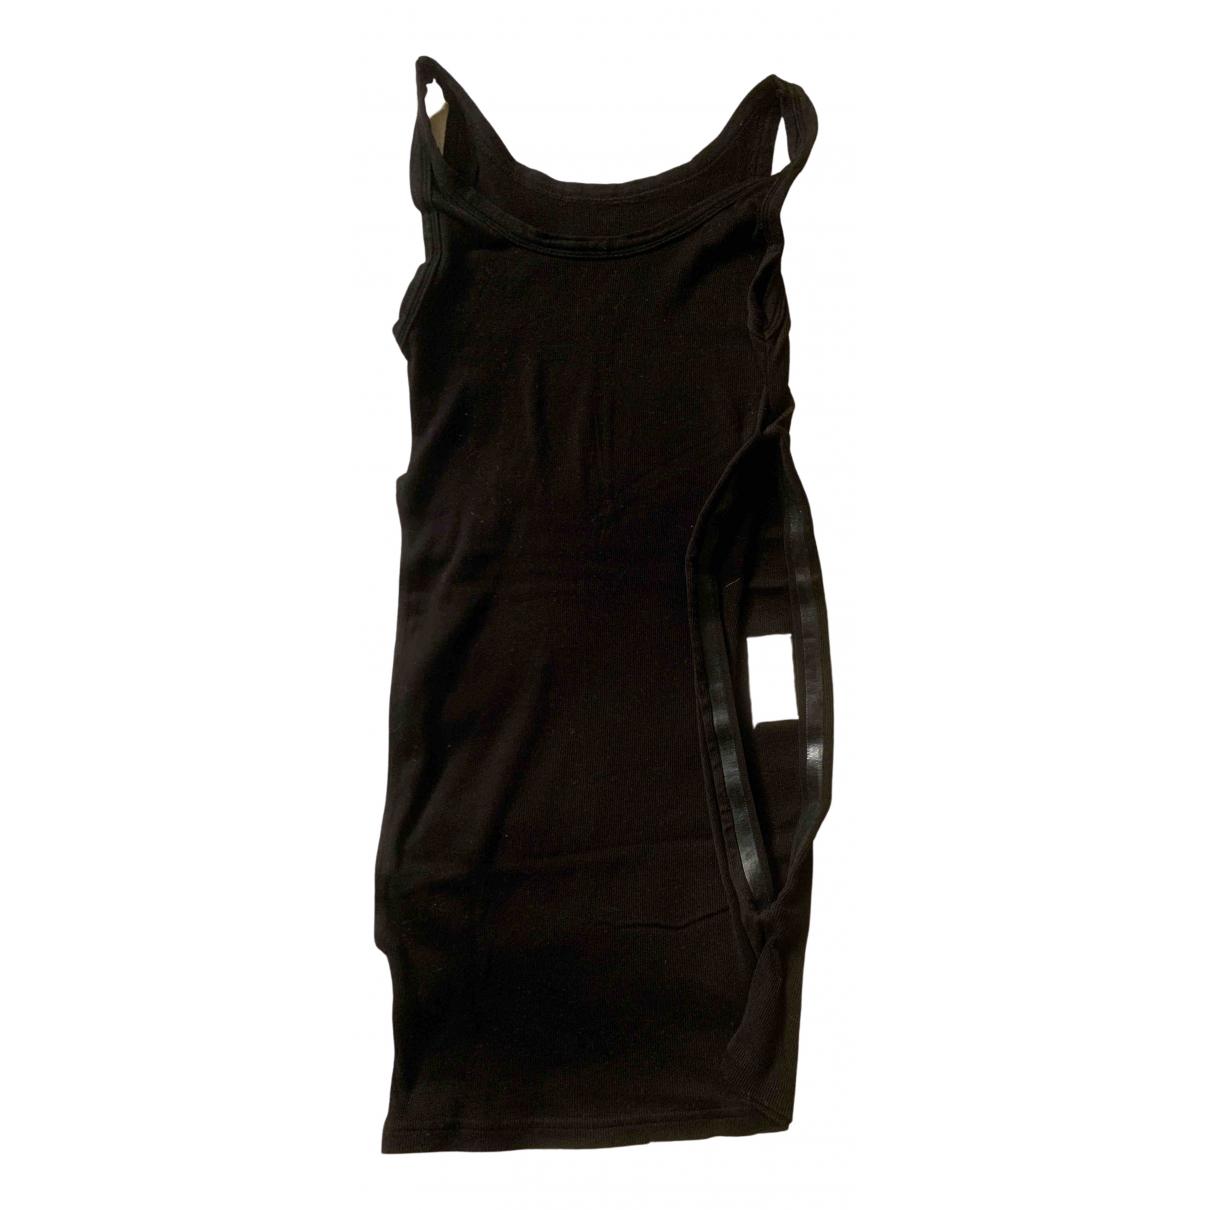 Maison Martin Margiela \N Black Cotton  top for Women S International